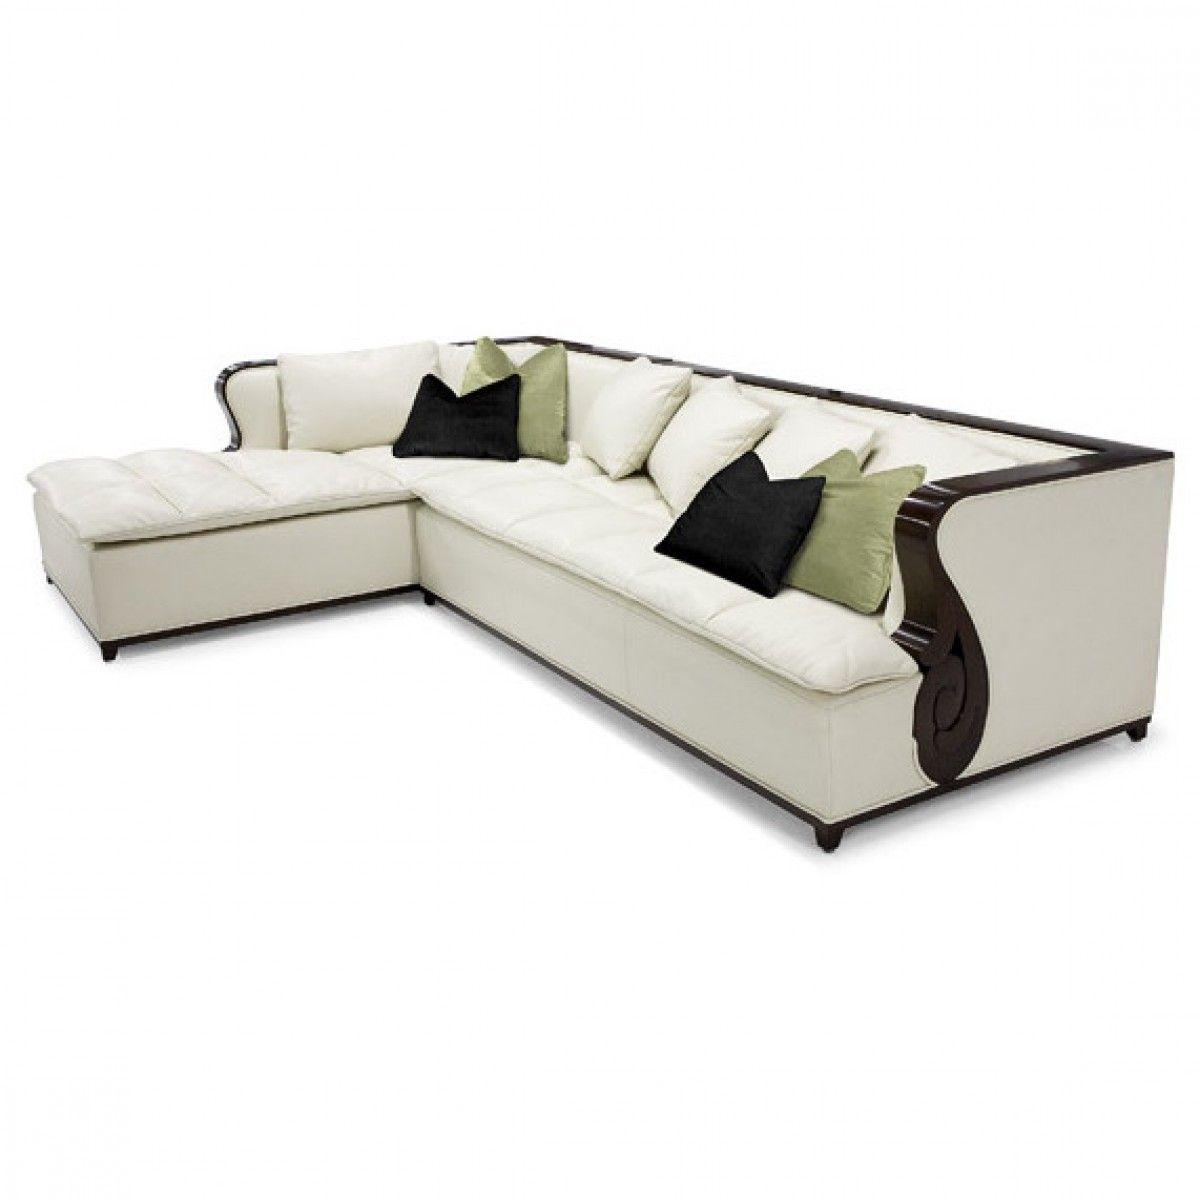 Christopher Guy The Hepburn Sectional Sofa · Art Deco ...